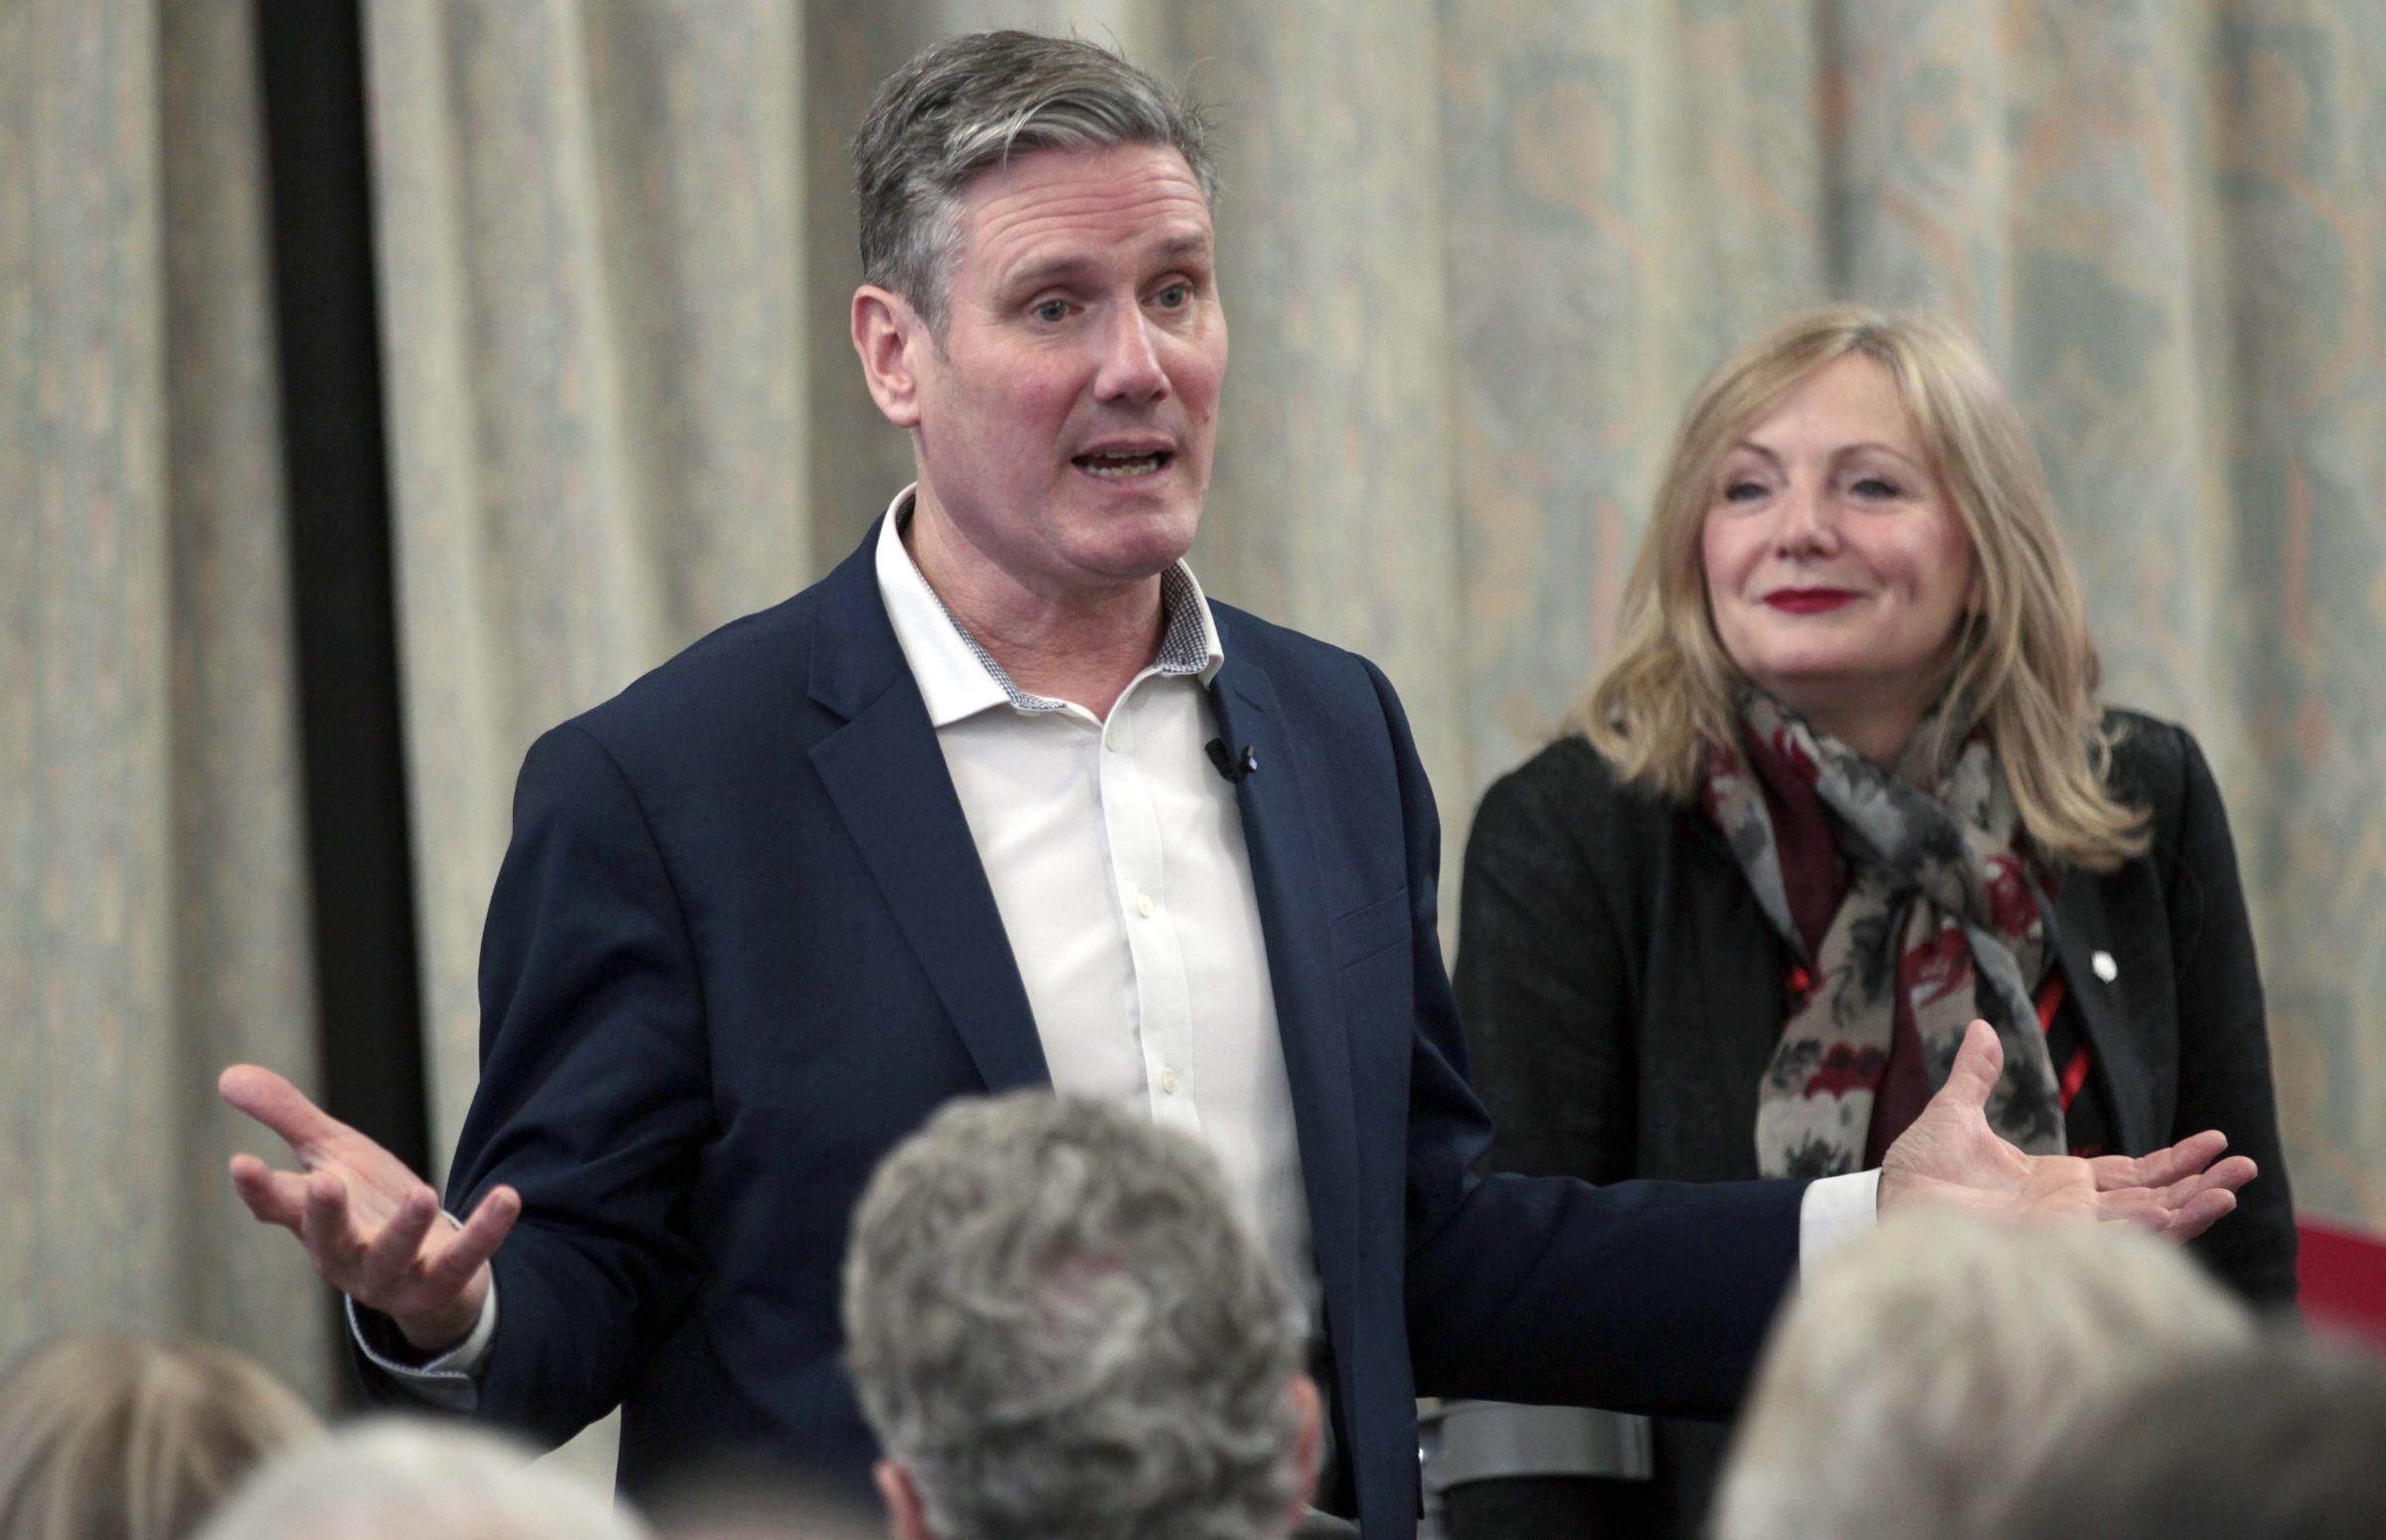 Labour leadership candidate visits Batley